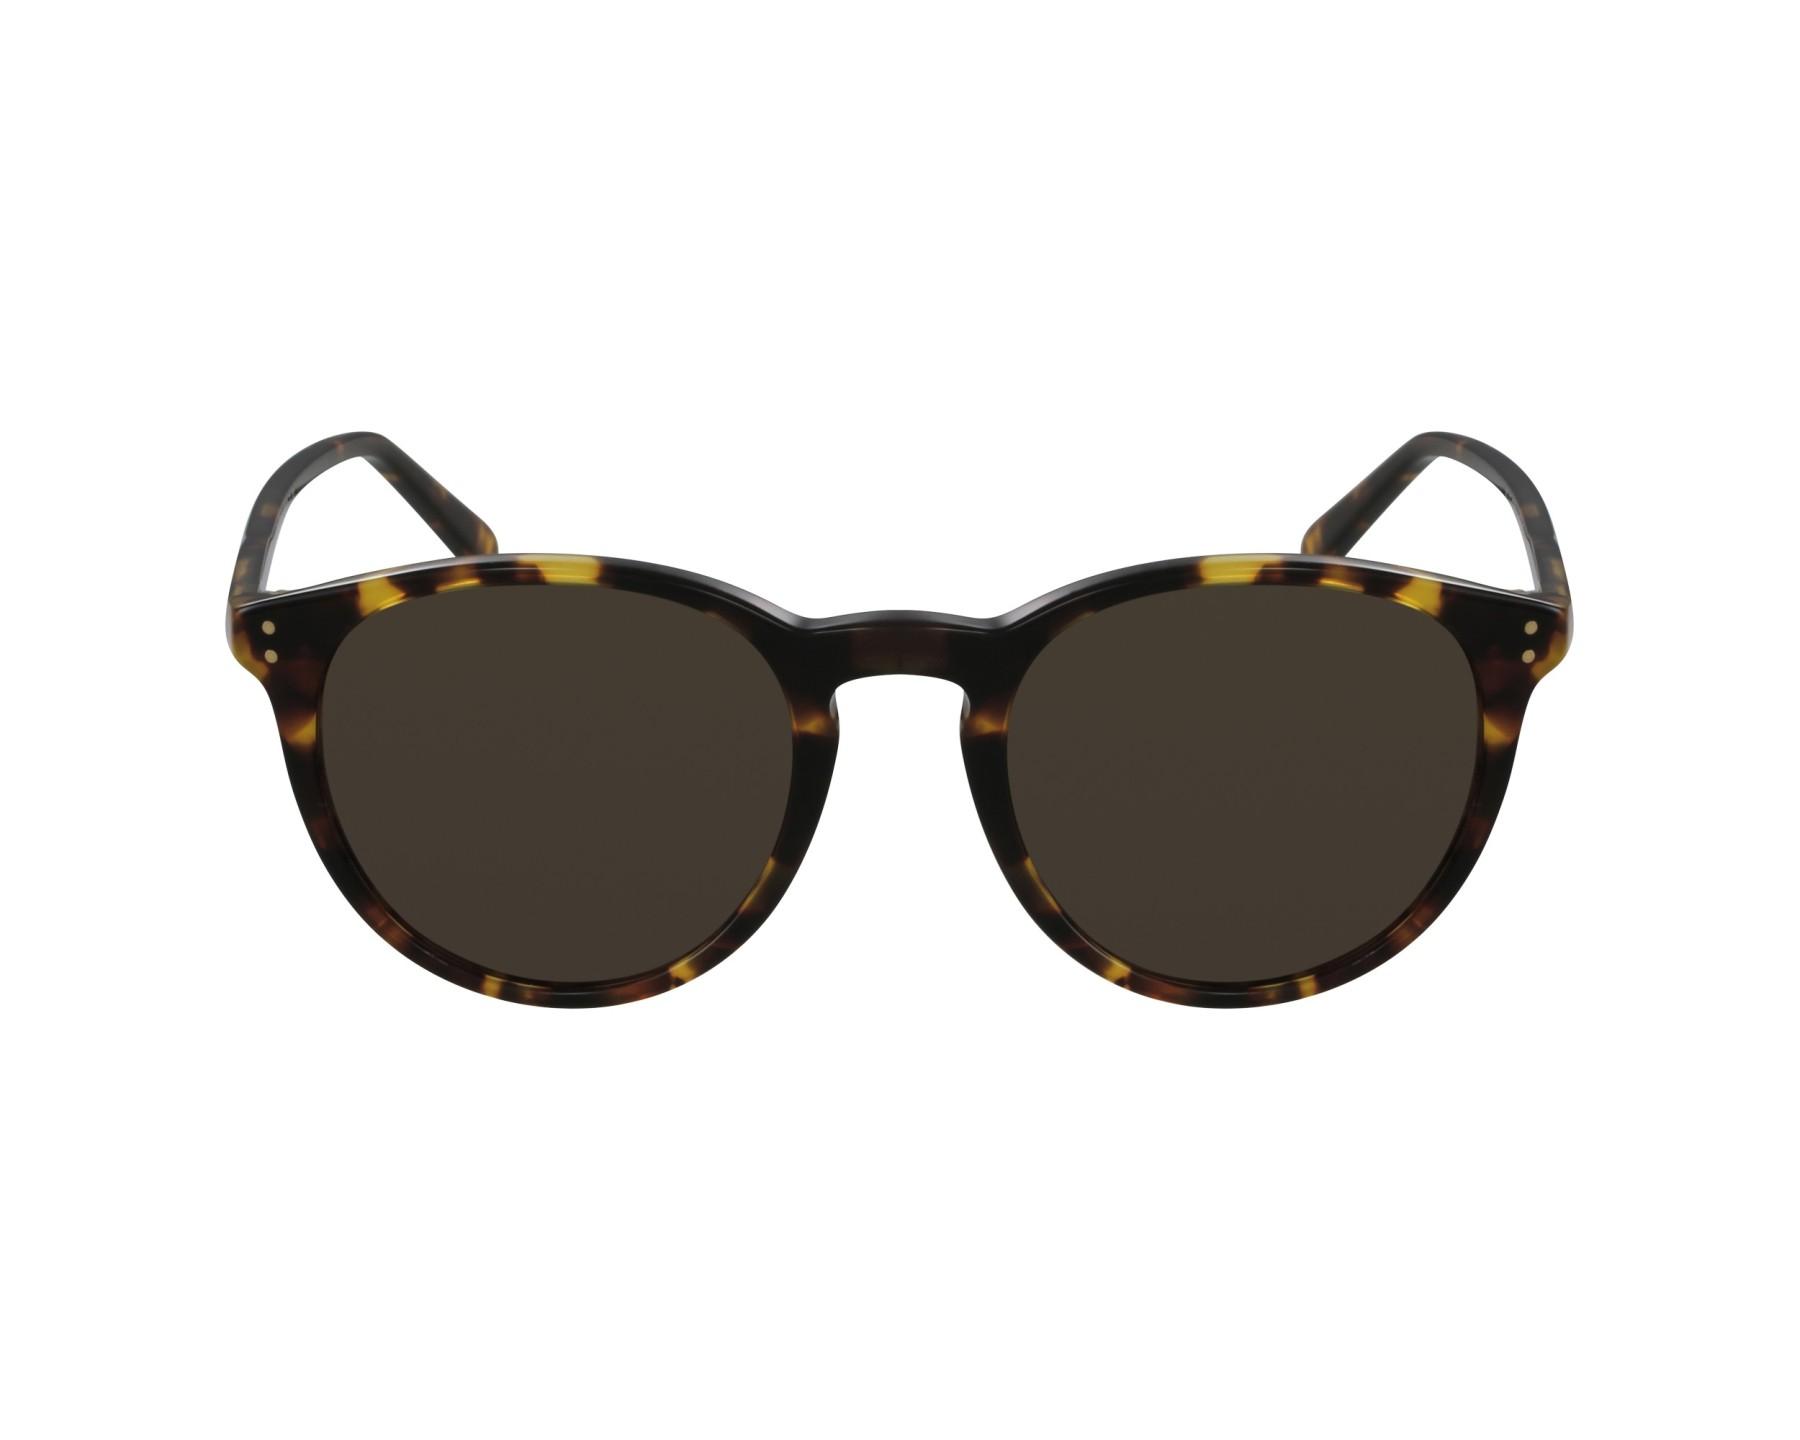 36f9f5cb2486e Sunglasses Polo Ralph Lauren PH-4110 5134 73 50-21 Havana Honey profile